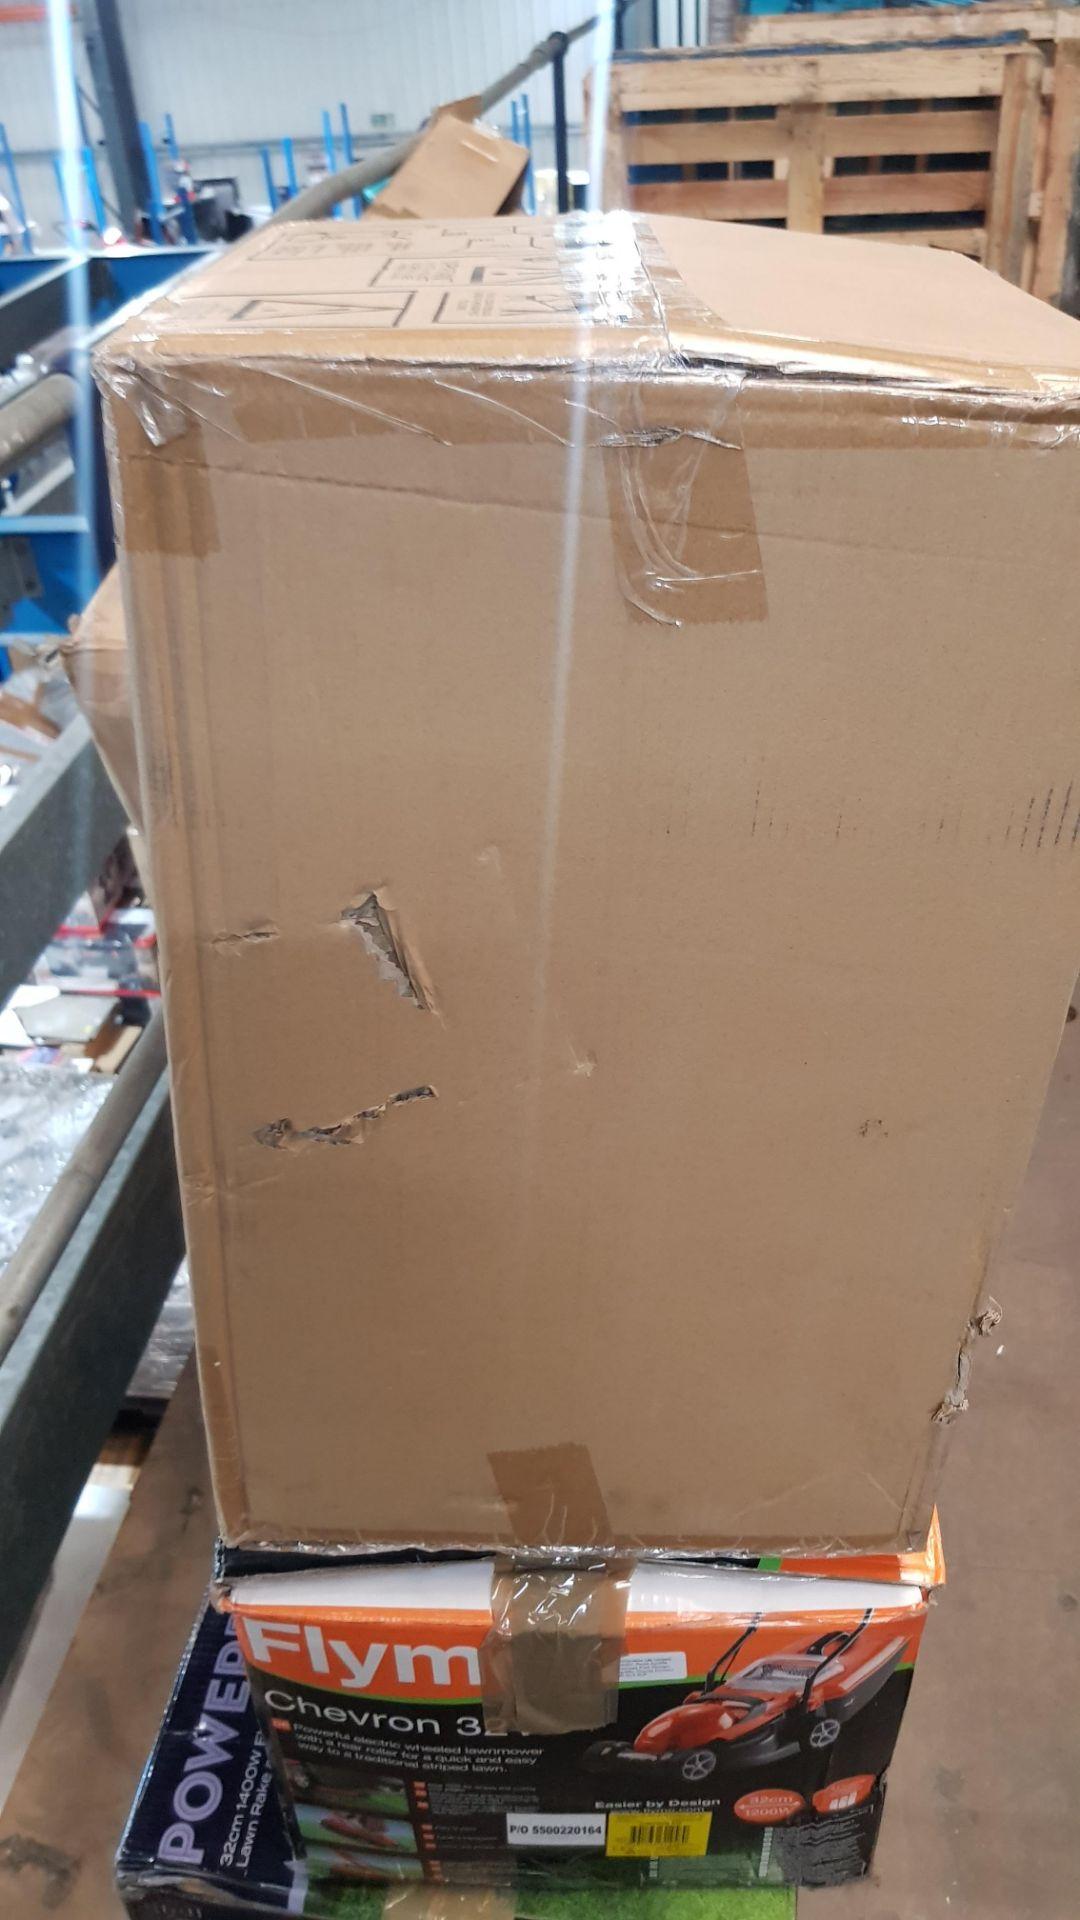 (P6) 1x La Hacienda Venezuela Clay Chimenea RRP £60. New, Sealed Item, With Slight Box Damage. - Image 3 of 4